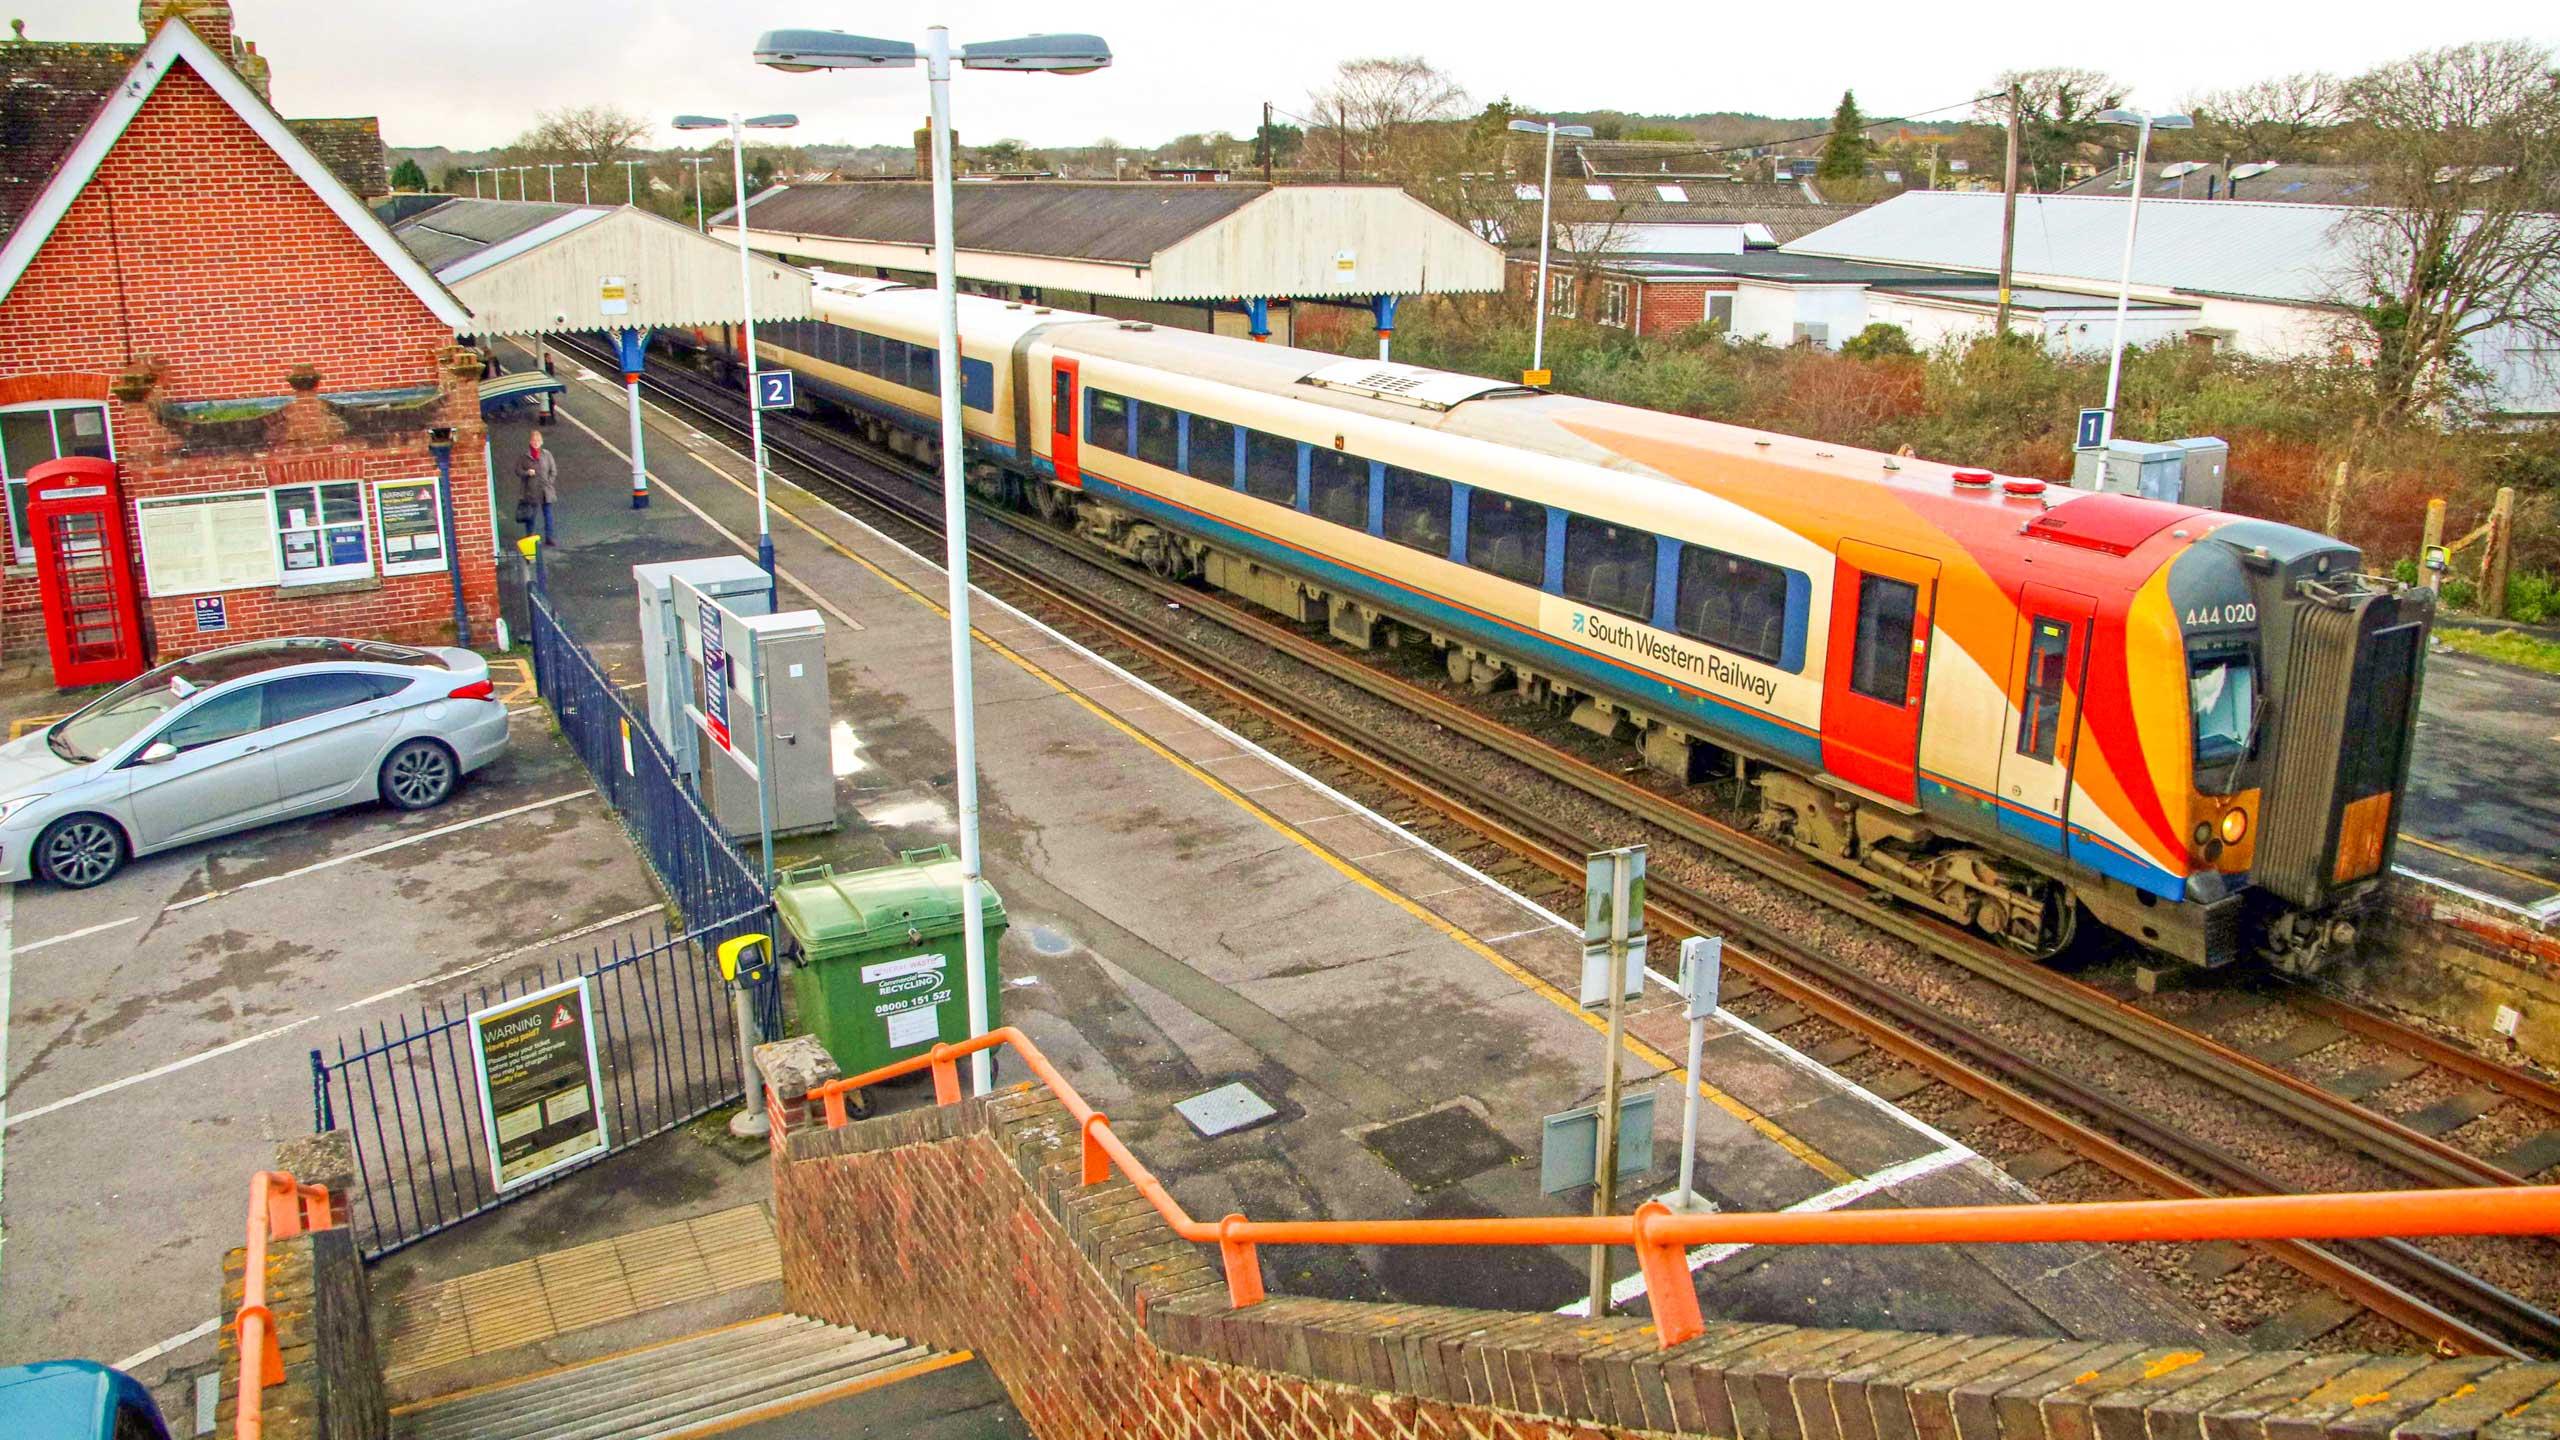 Purbeck Community Rail Partnership Wareham Train Station 004 2560x1440px